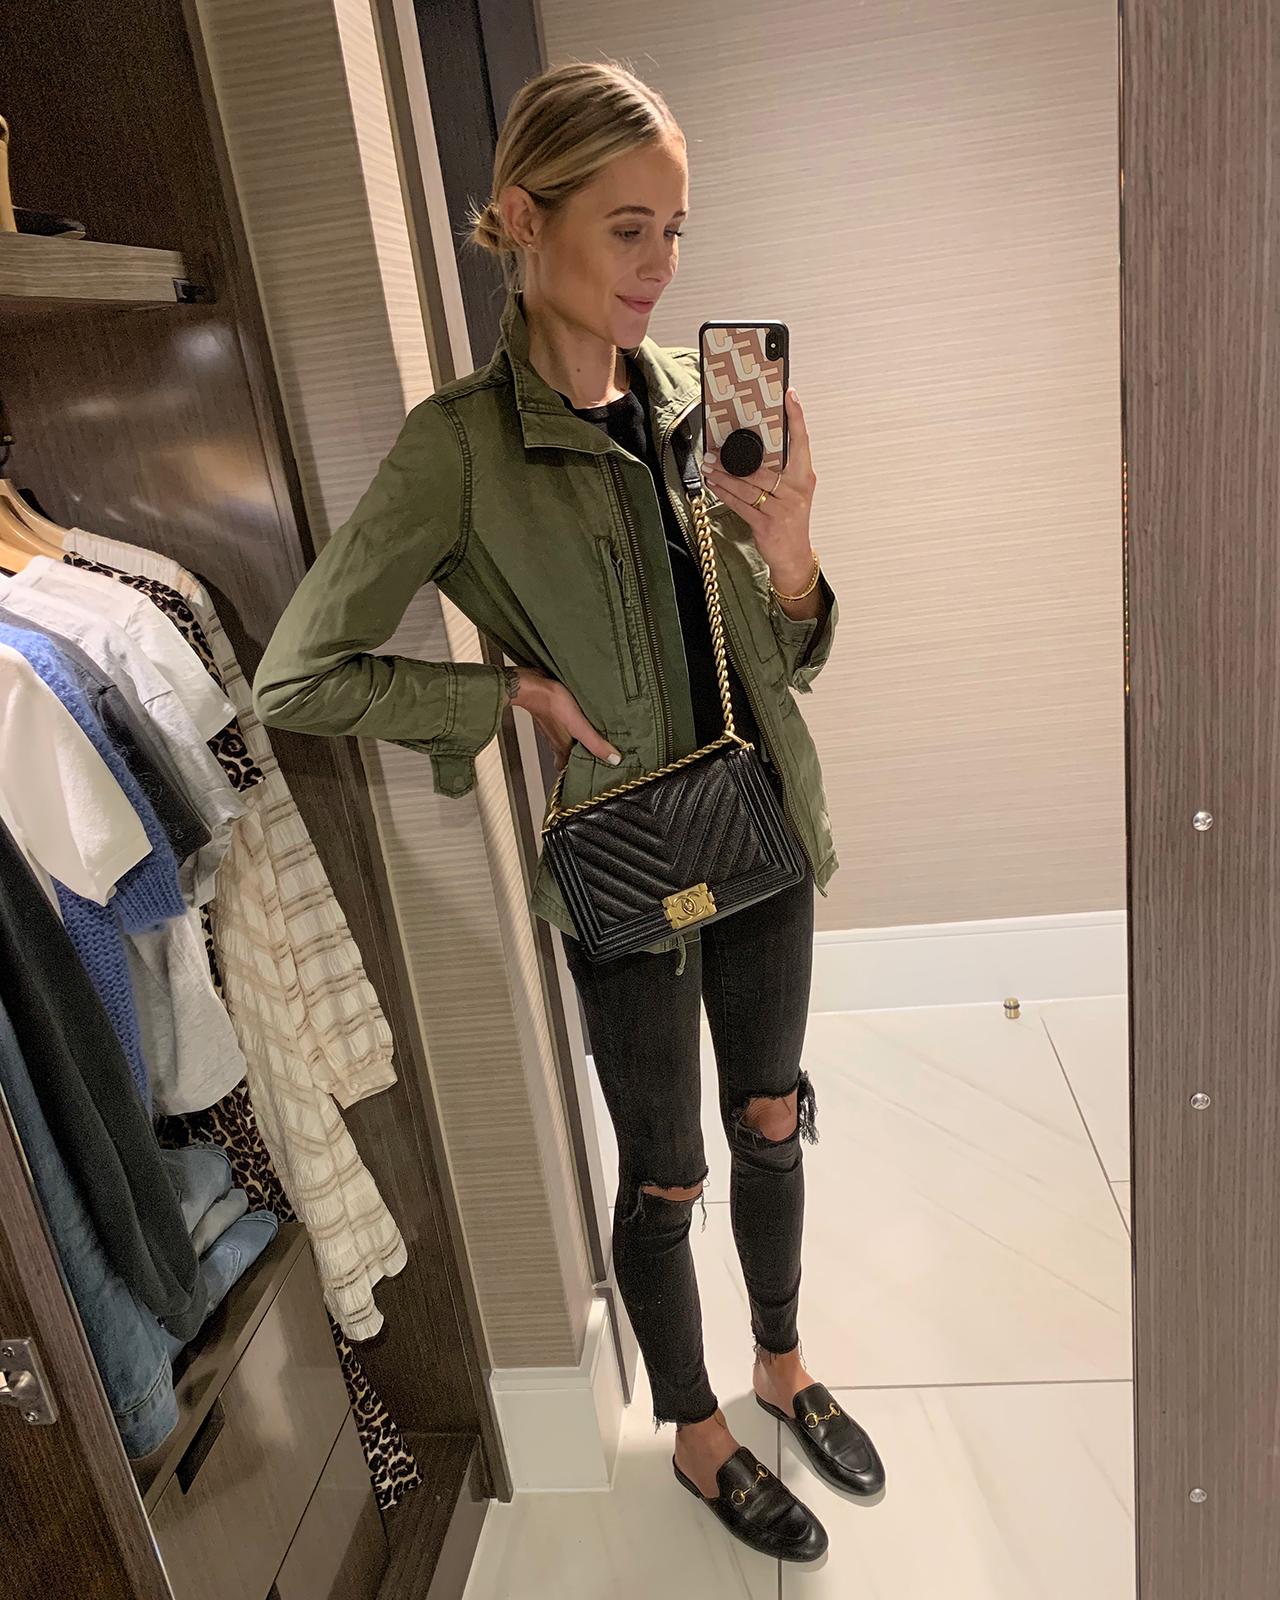 Fashion Jackson Wearing Green Utility Jacket Black Top Denim Ripped Skinny Jeans Gucci Ace Sneakers Chanel Black Boy Bag